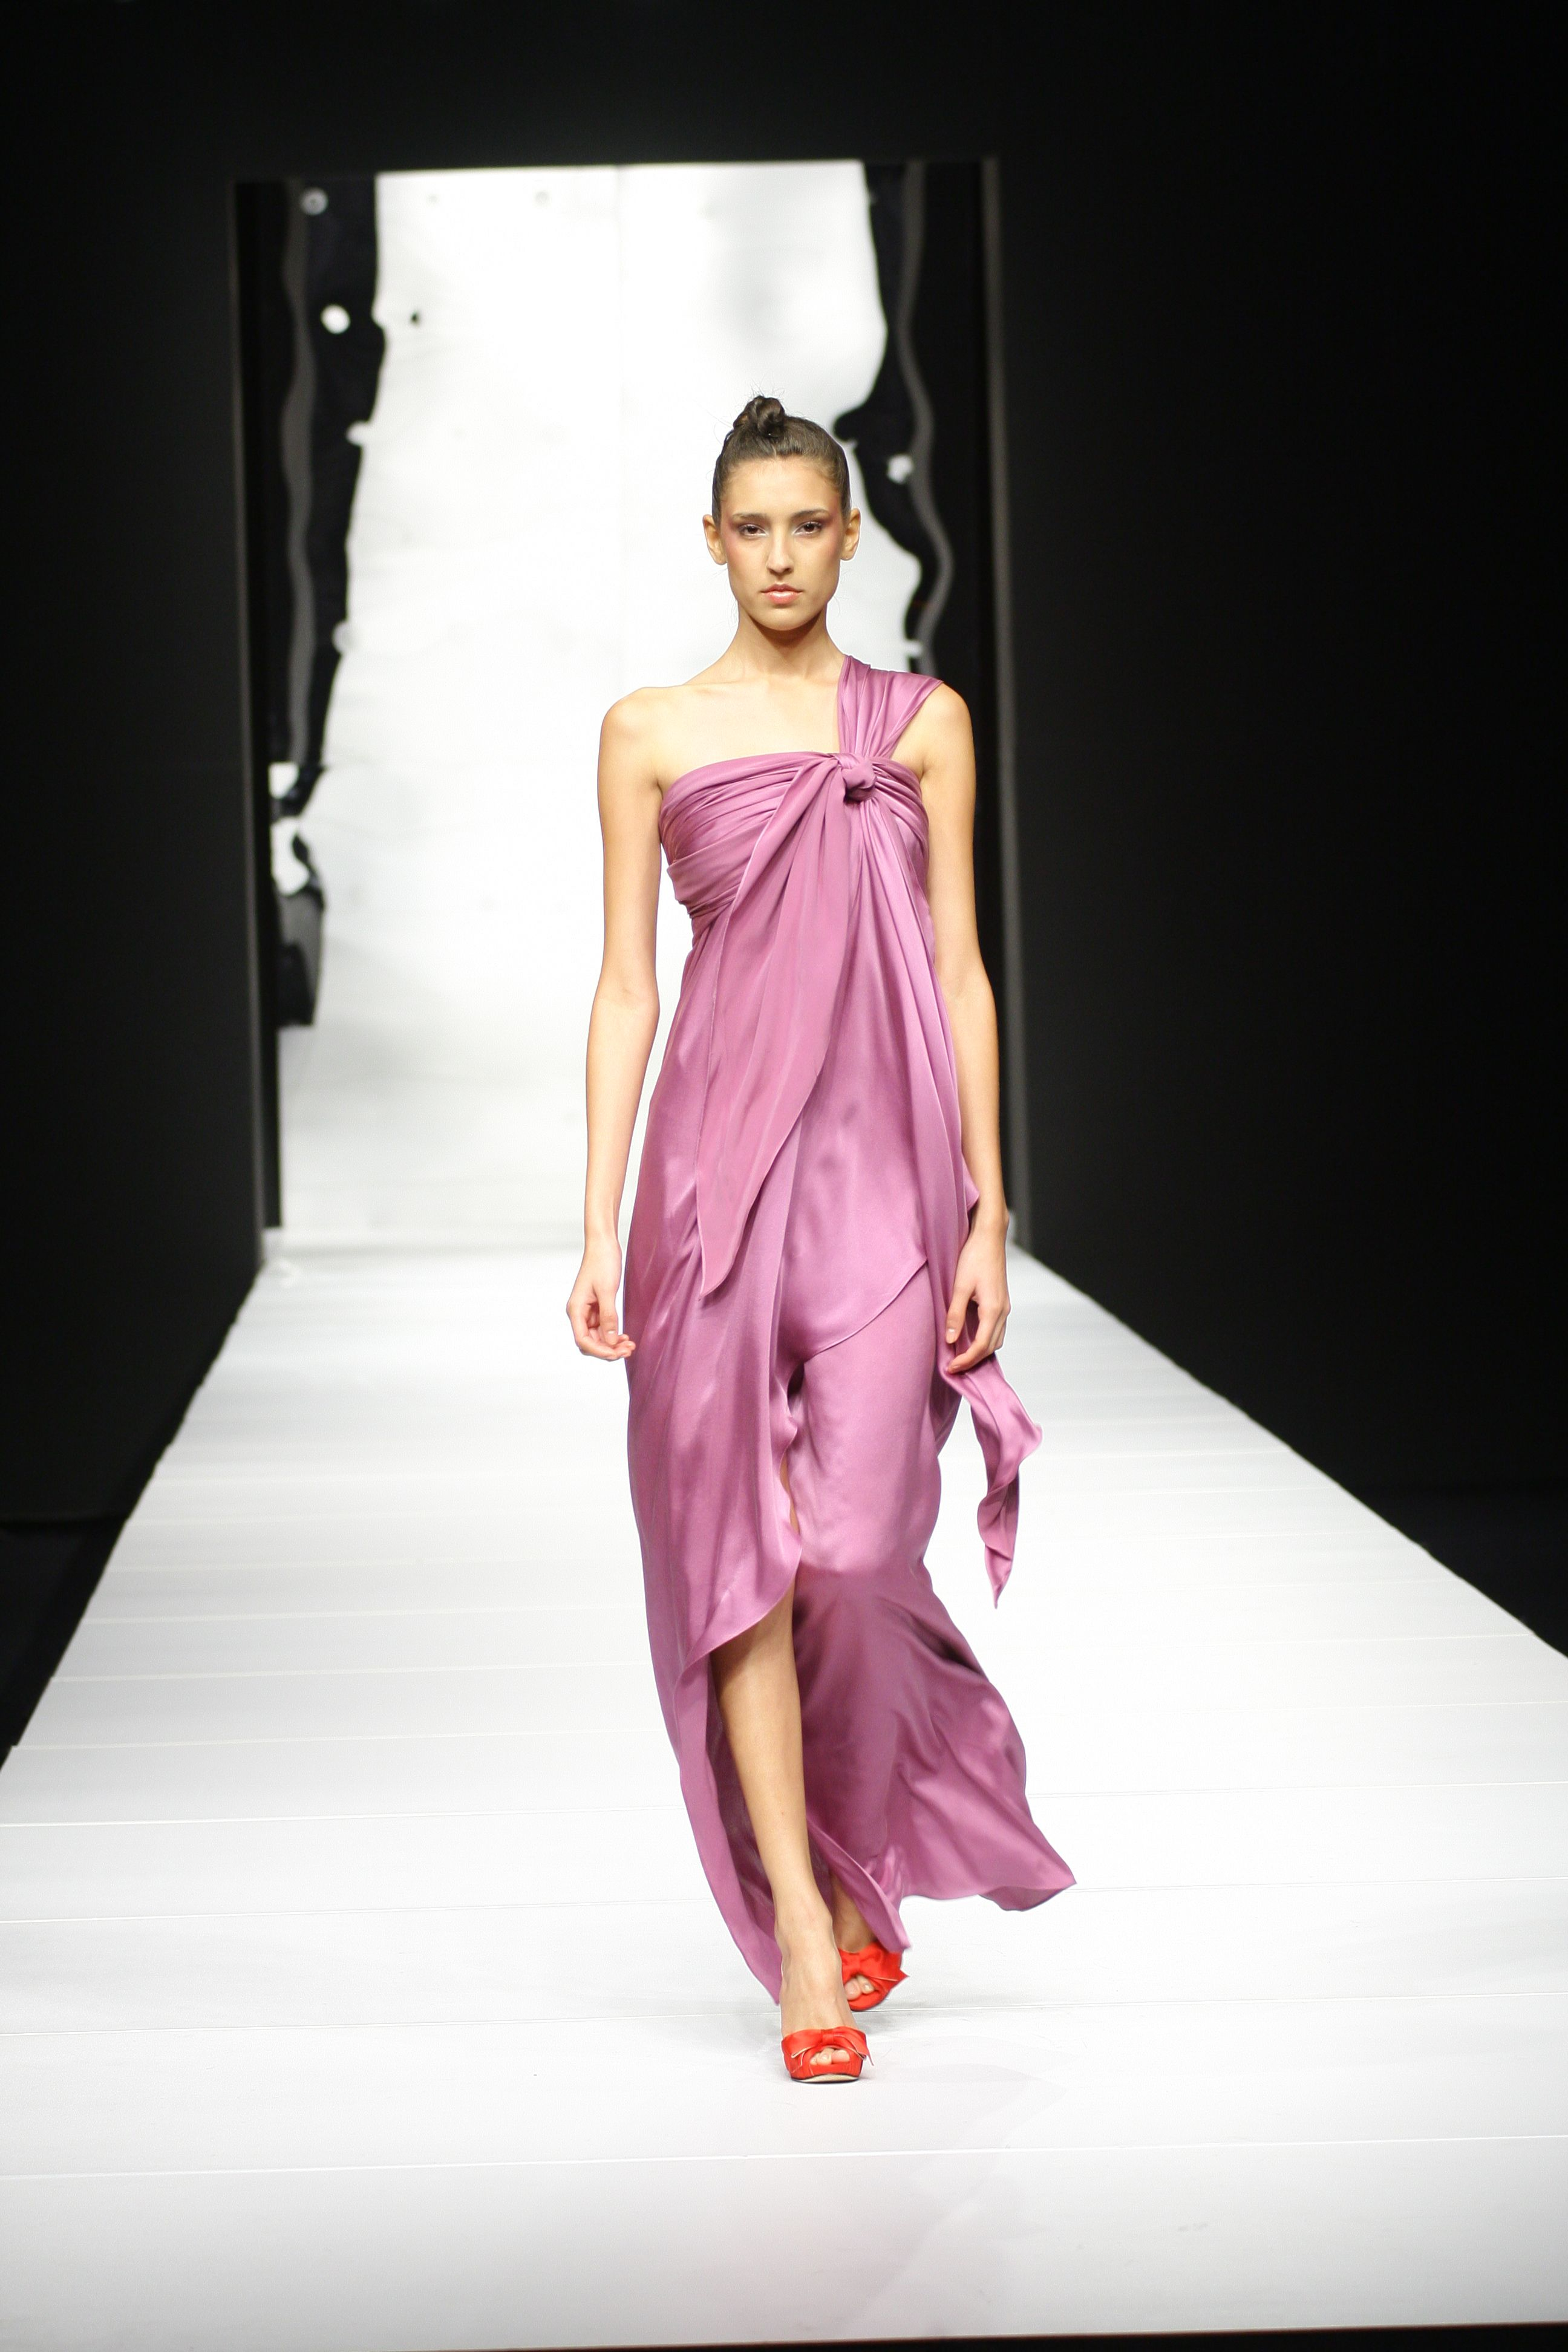 Roman toga style dresses